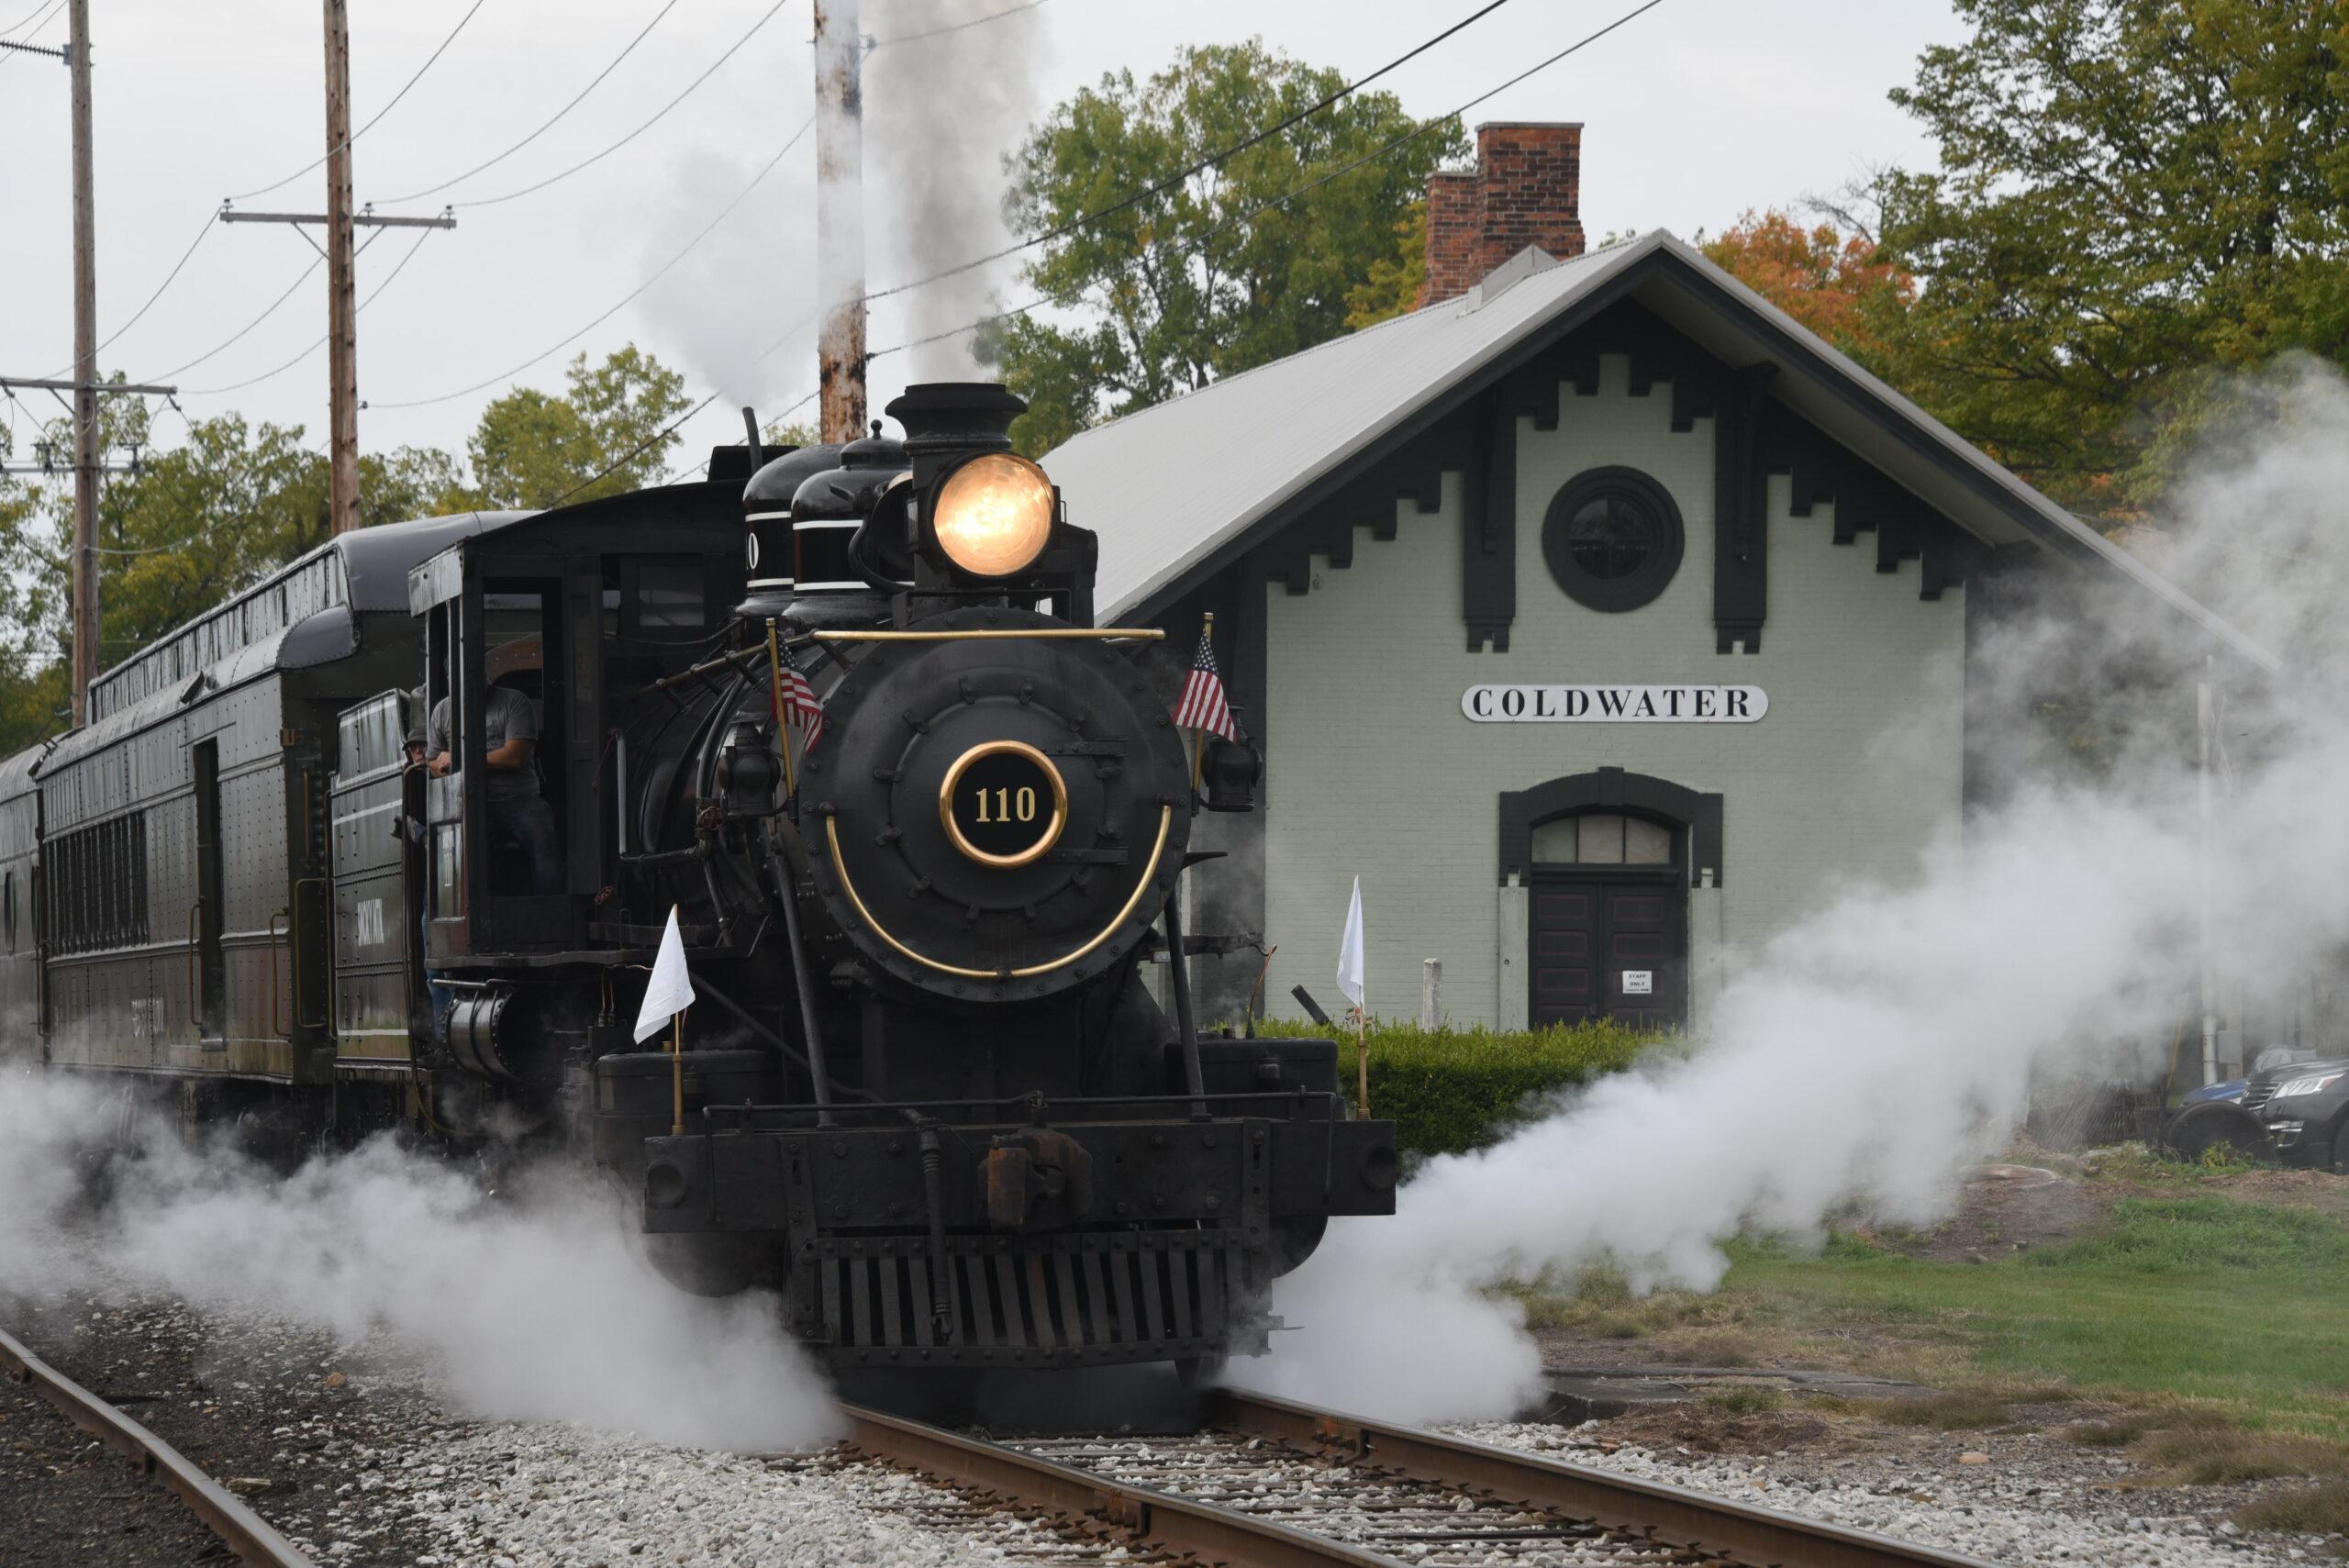 Small black steam locomotive departs train station.